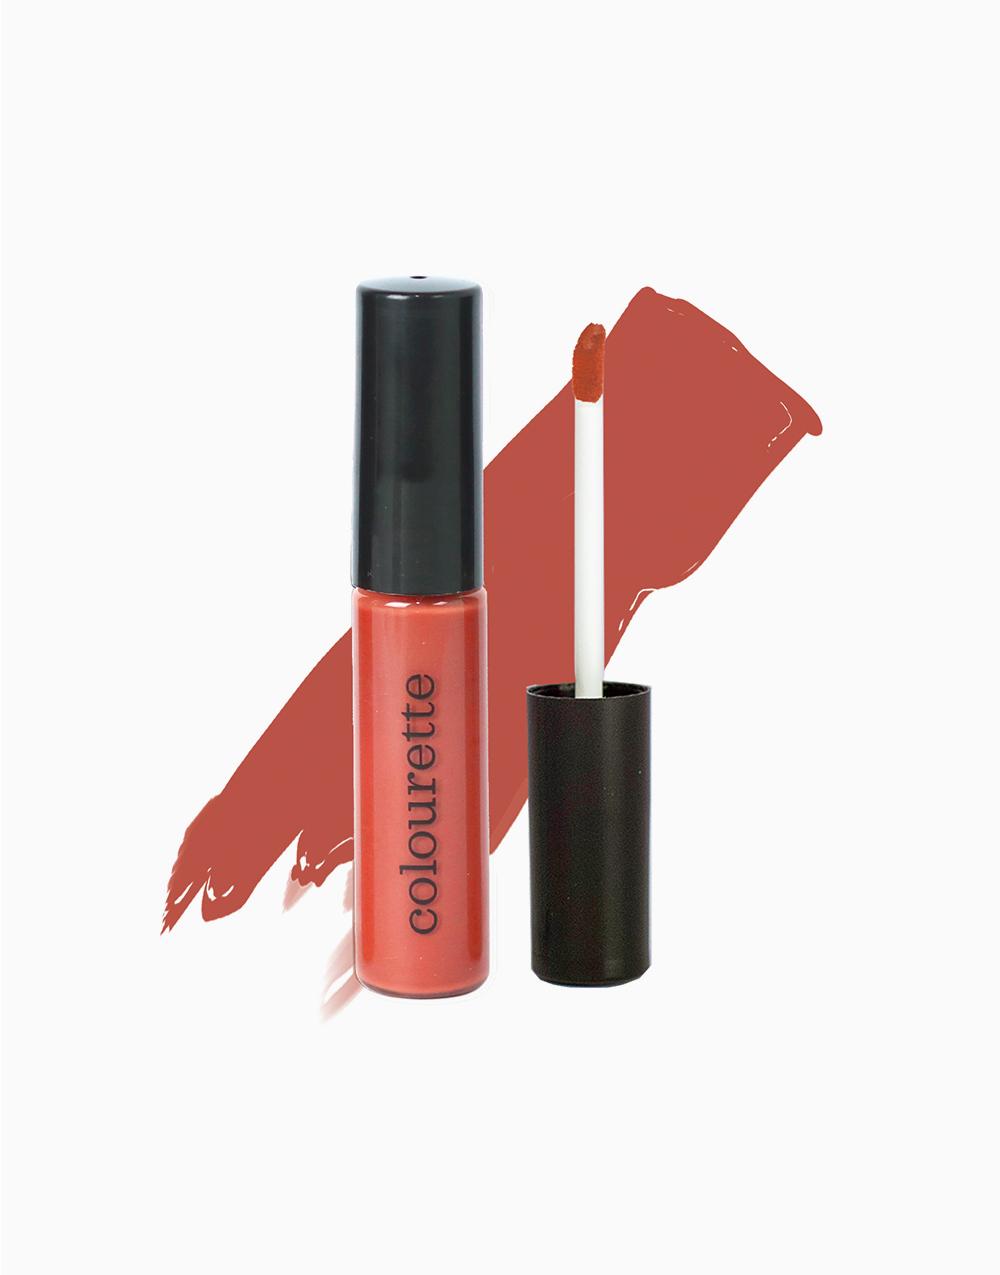 Colourtint Fresh (New) by Colourette | Maya